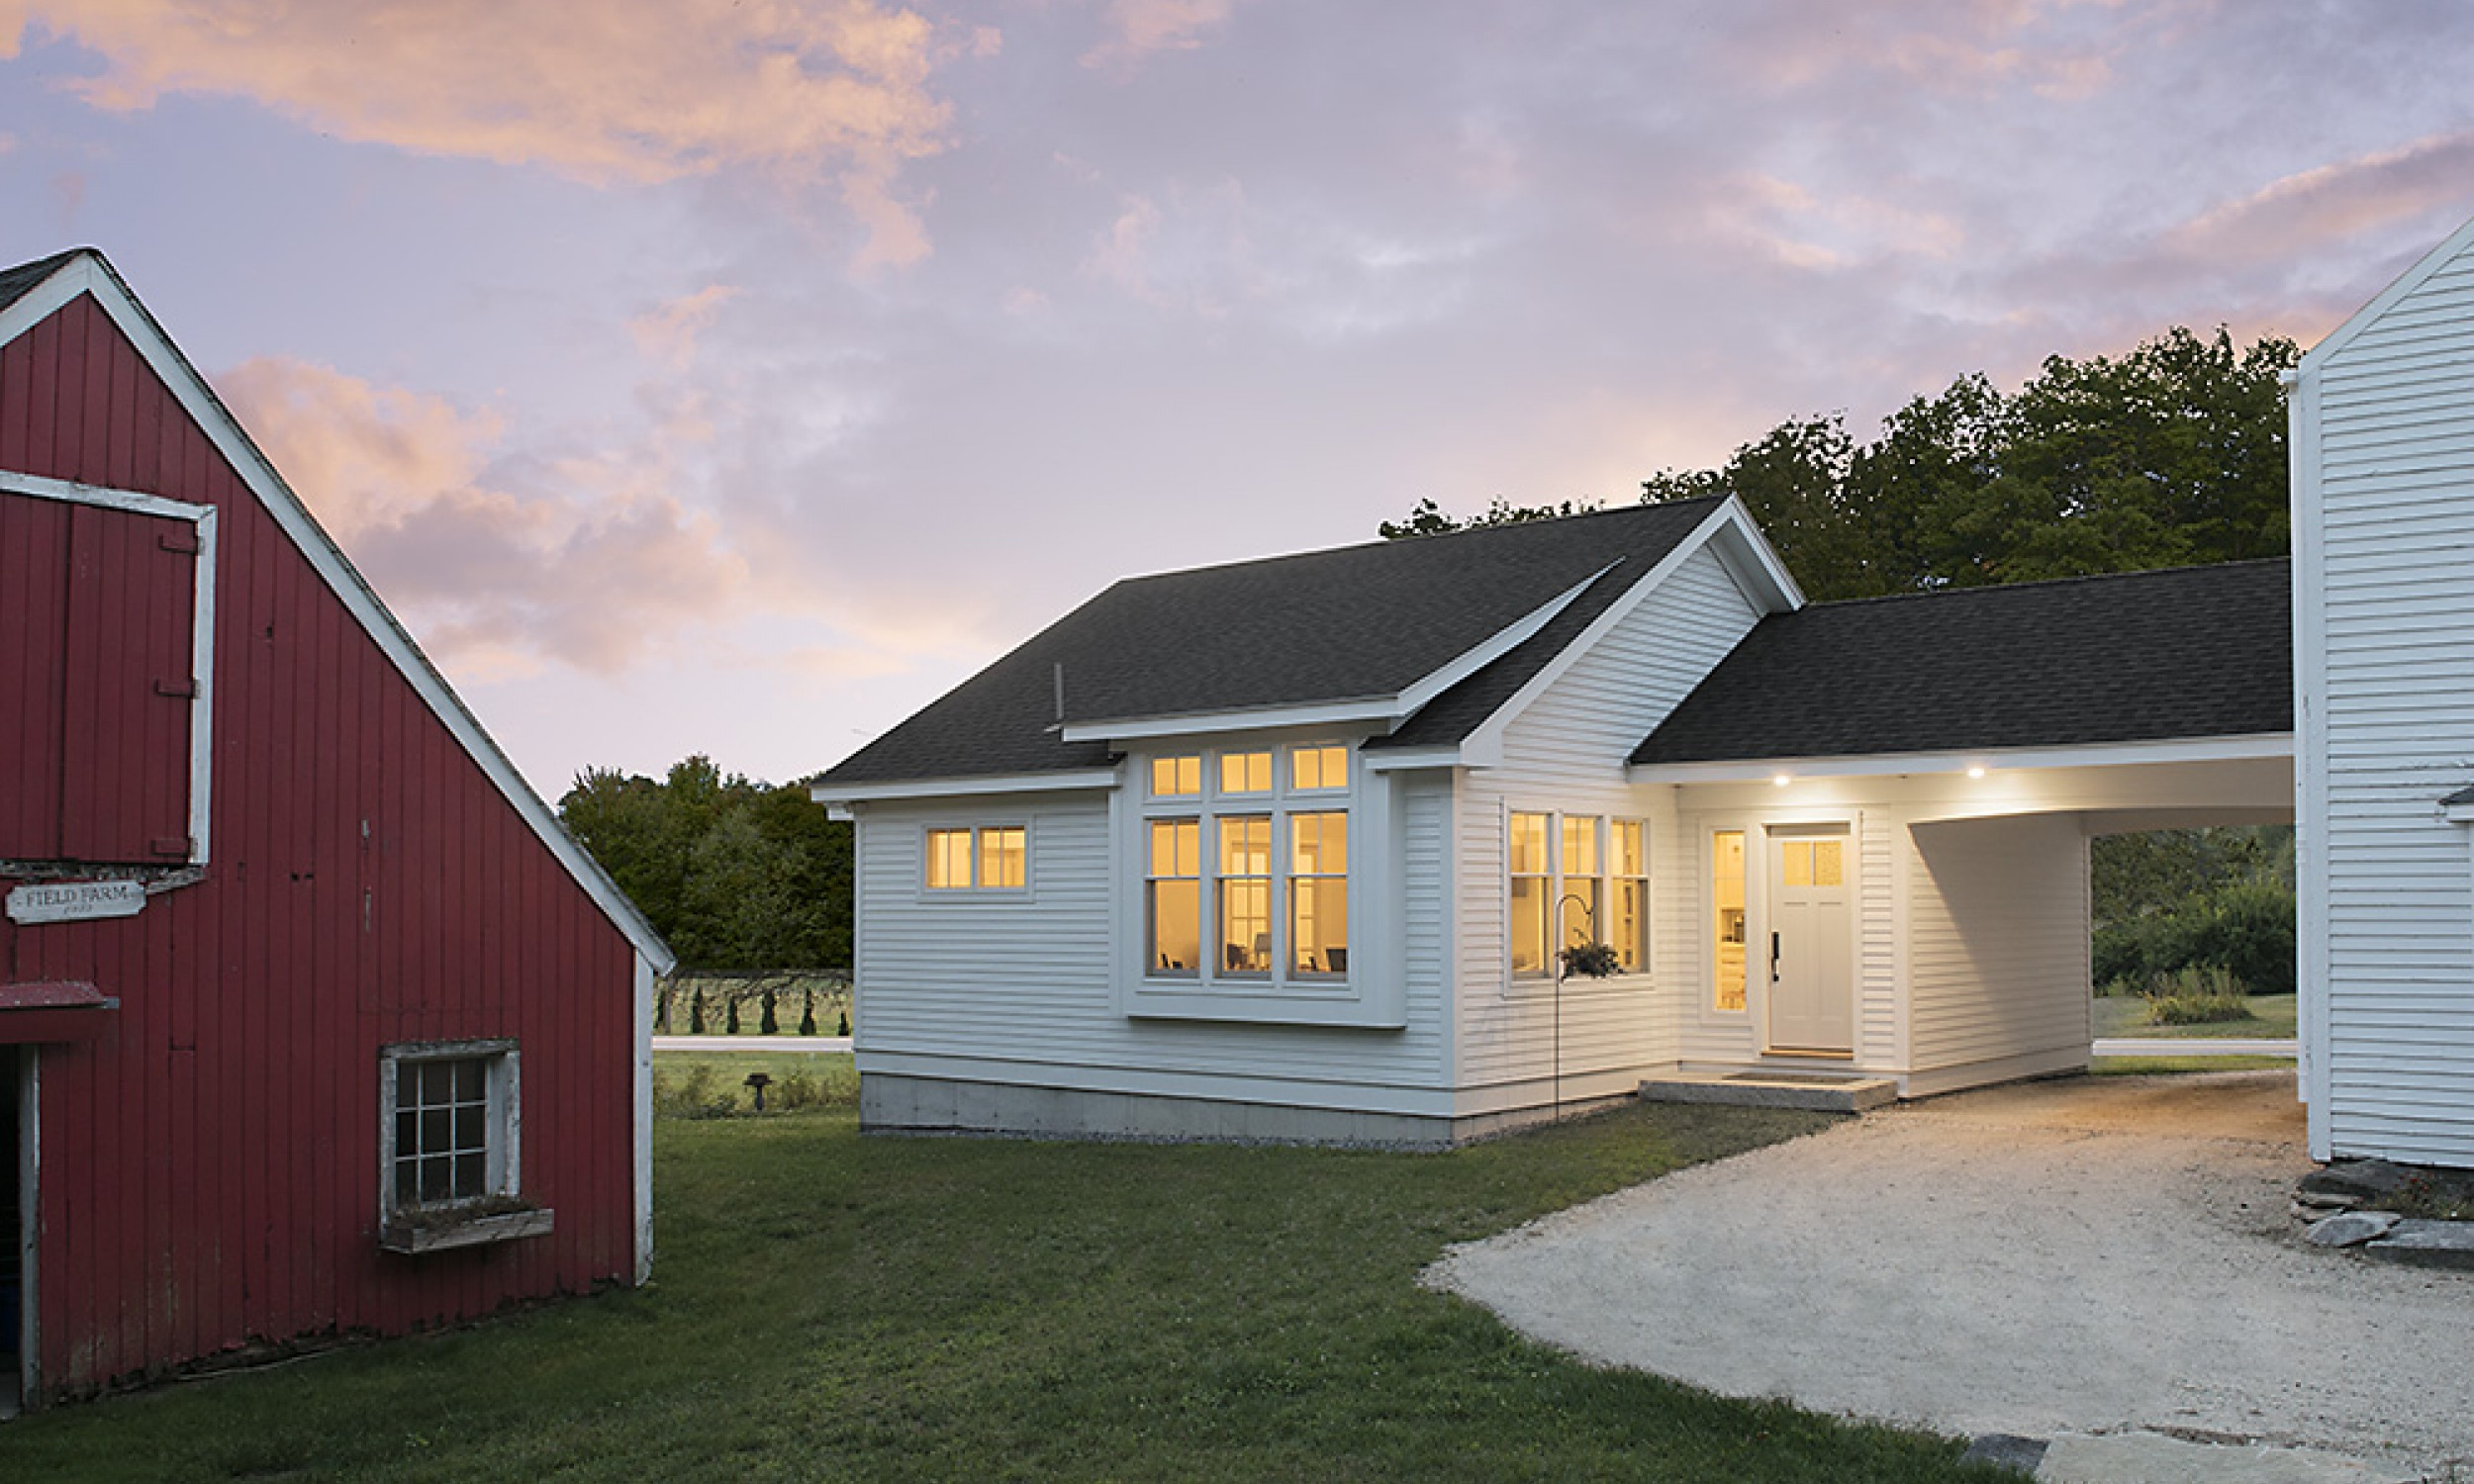 Apartment exterior, Sunset, South Elevation, Maine Architect, Carport